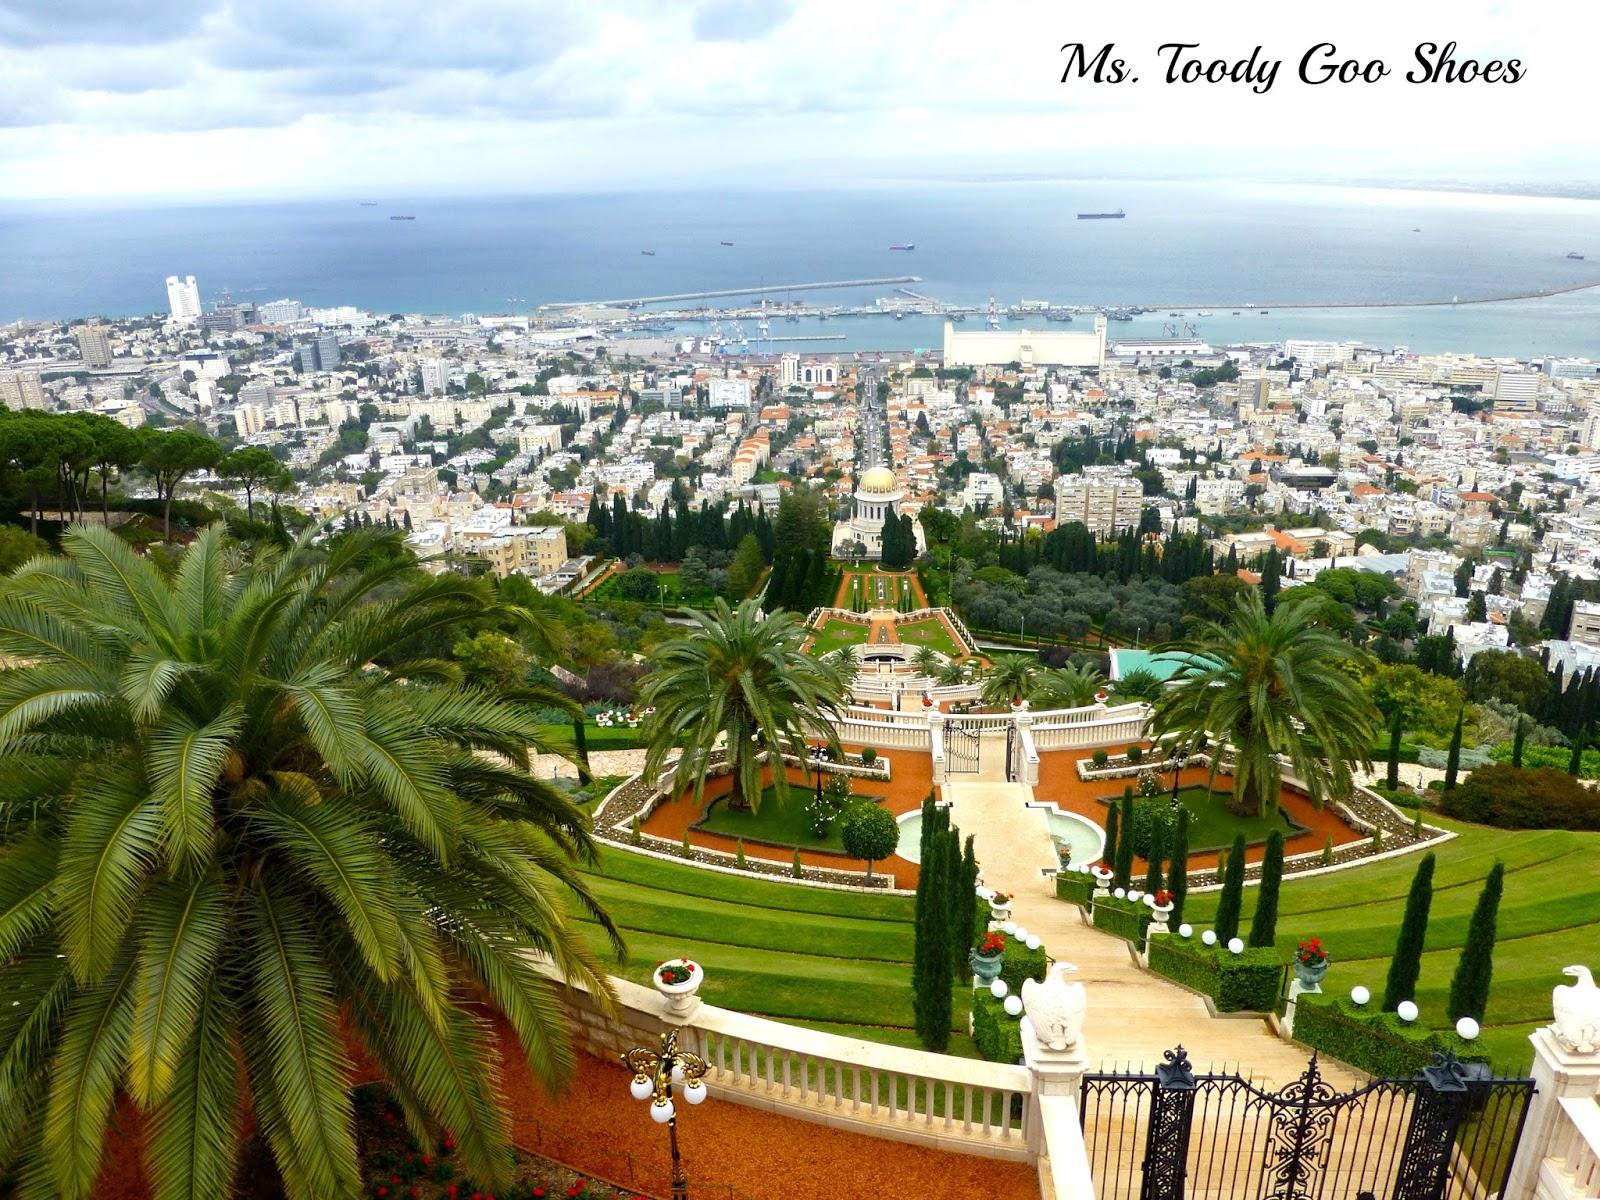 Bahai Gardens - Haifa, Israel  --- Ms. Toody Goo Shoes